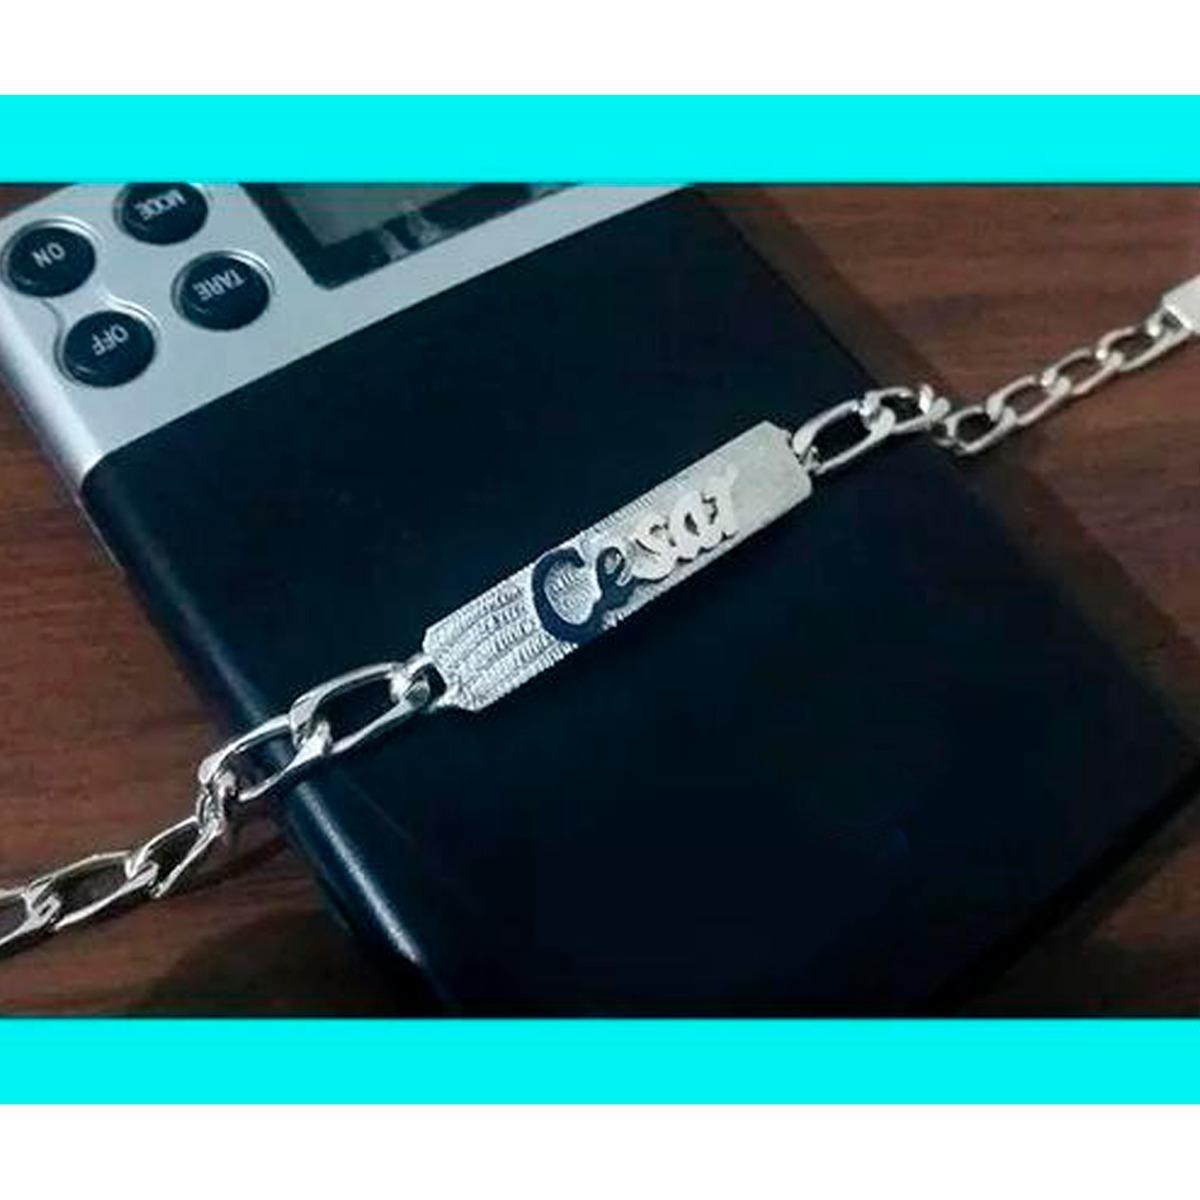 3ebab02179c5 Esclava De Plata Con Tu Nombre Envío Gratis -   781.00 en Mercado Libre